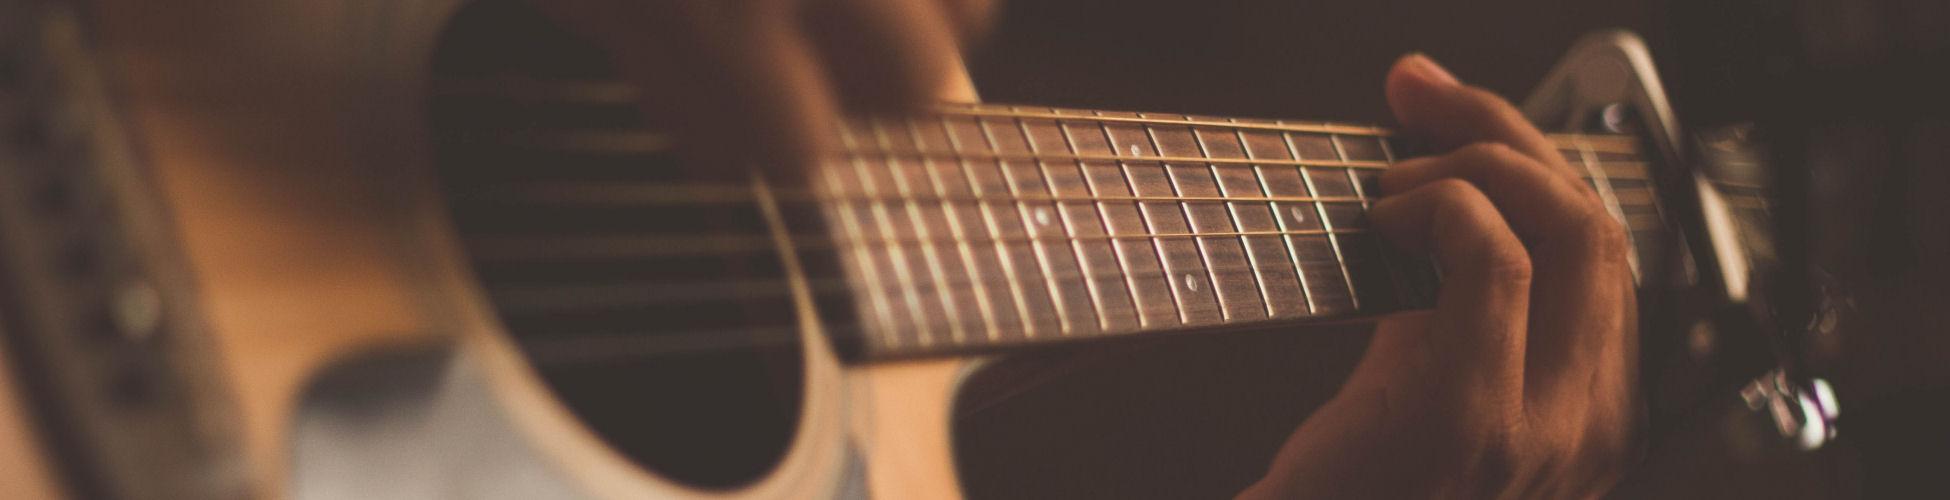 Knysna Methodist Church - Worship/Sound/Media